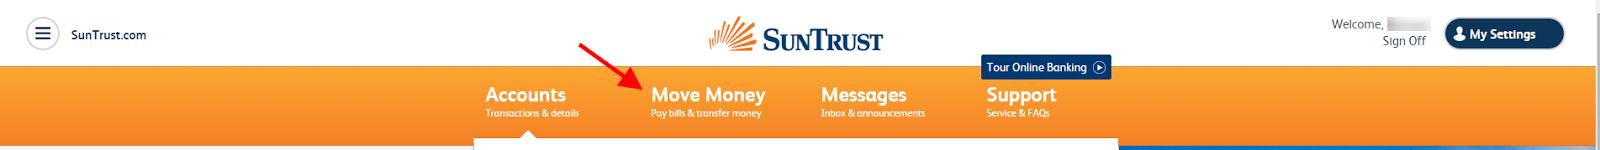 suntrust bank online